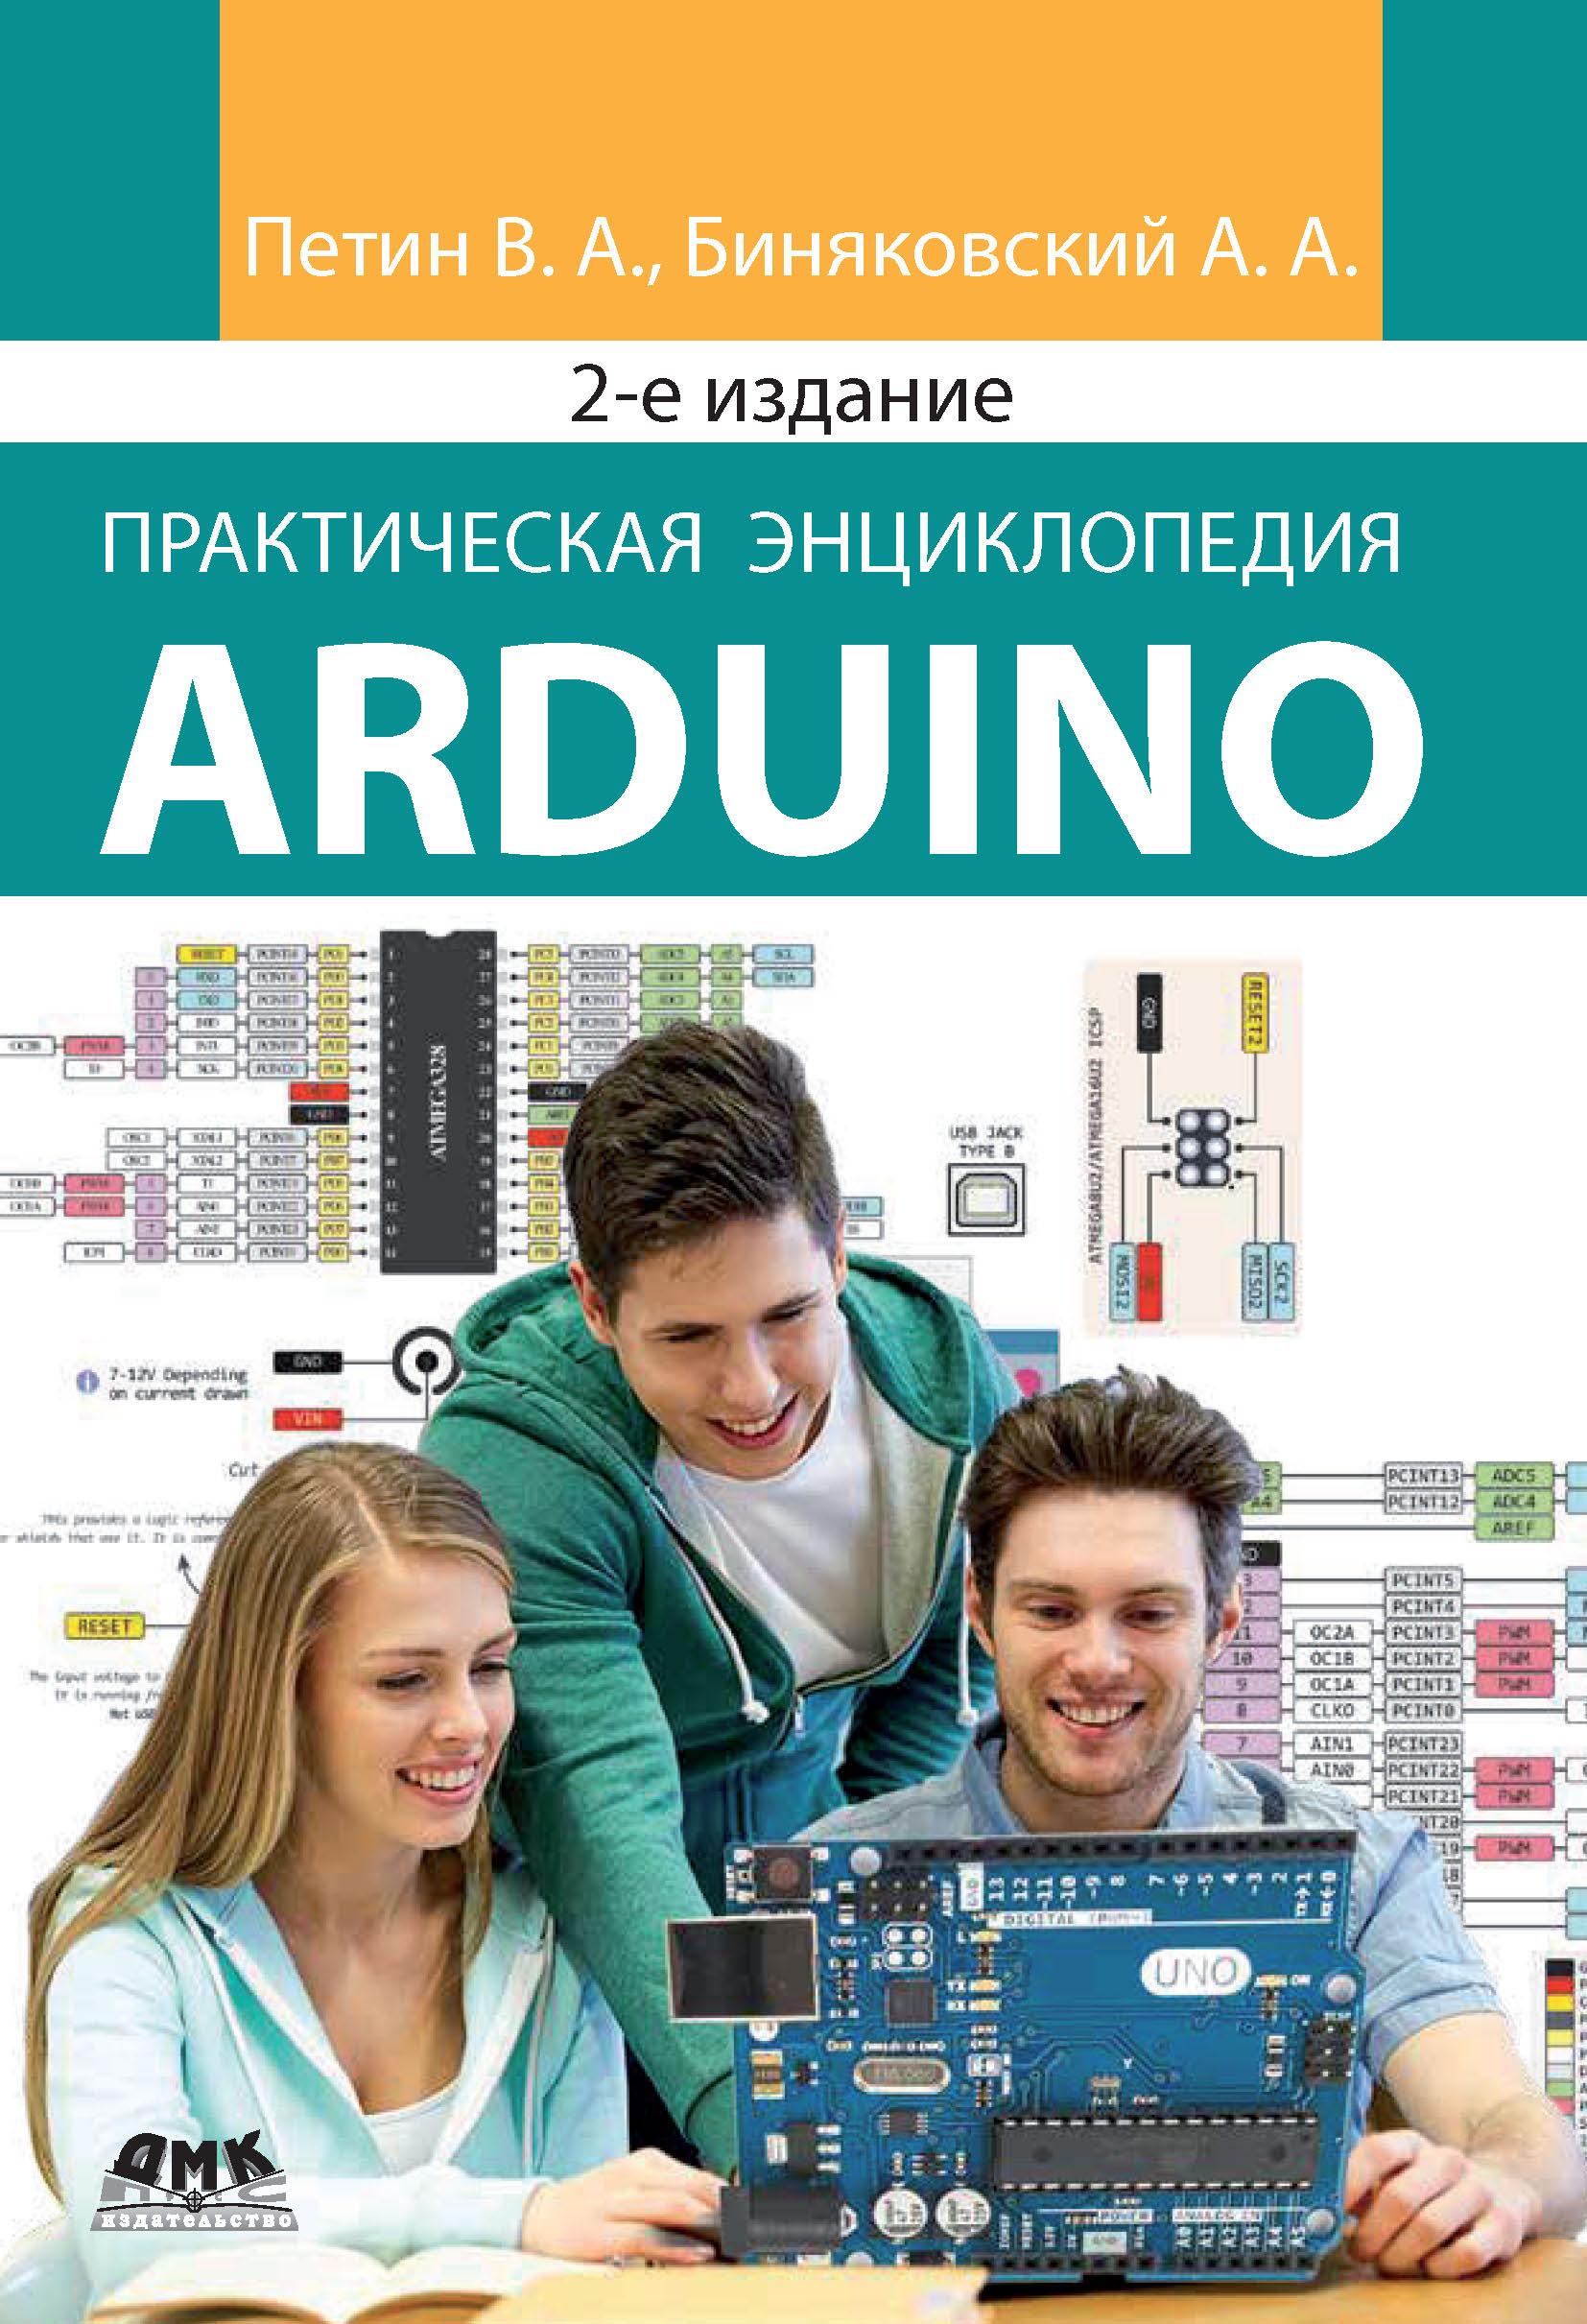 Виктор Петин Практическая энциклопедия Arduino петин в практическая энциклопедия arduino